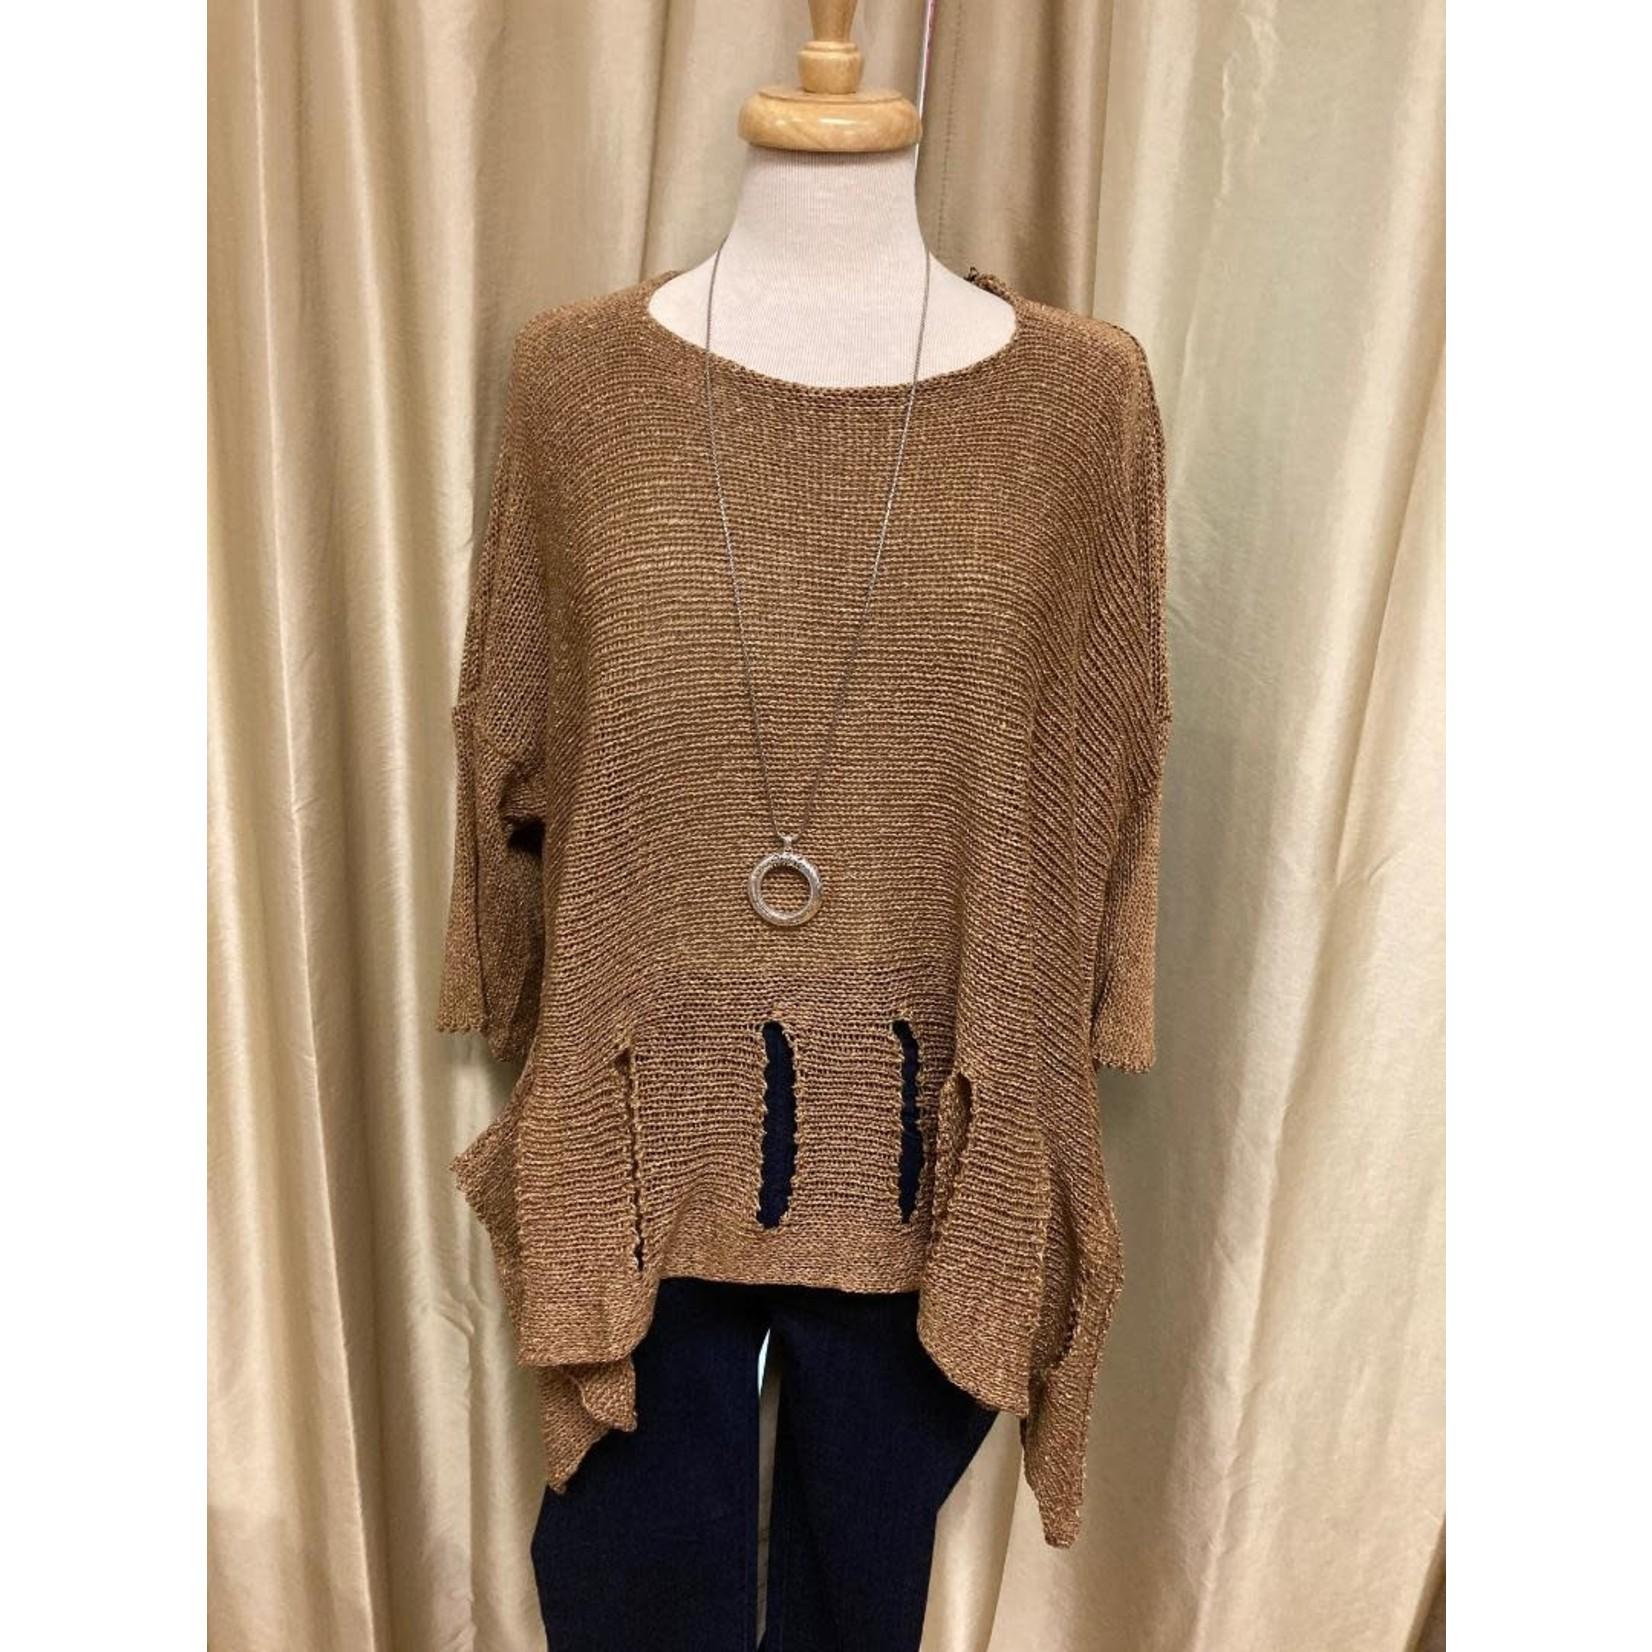 Holey Moley Sweater Fine Gauge  O/S Coffee Bean